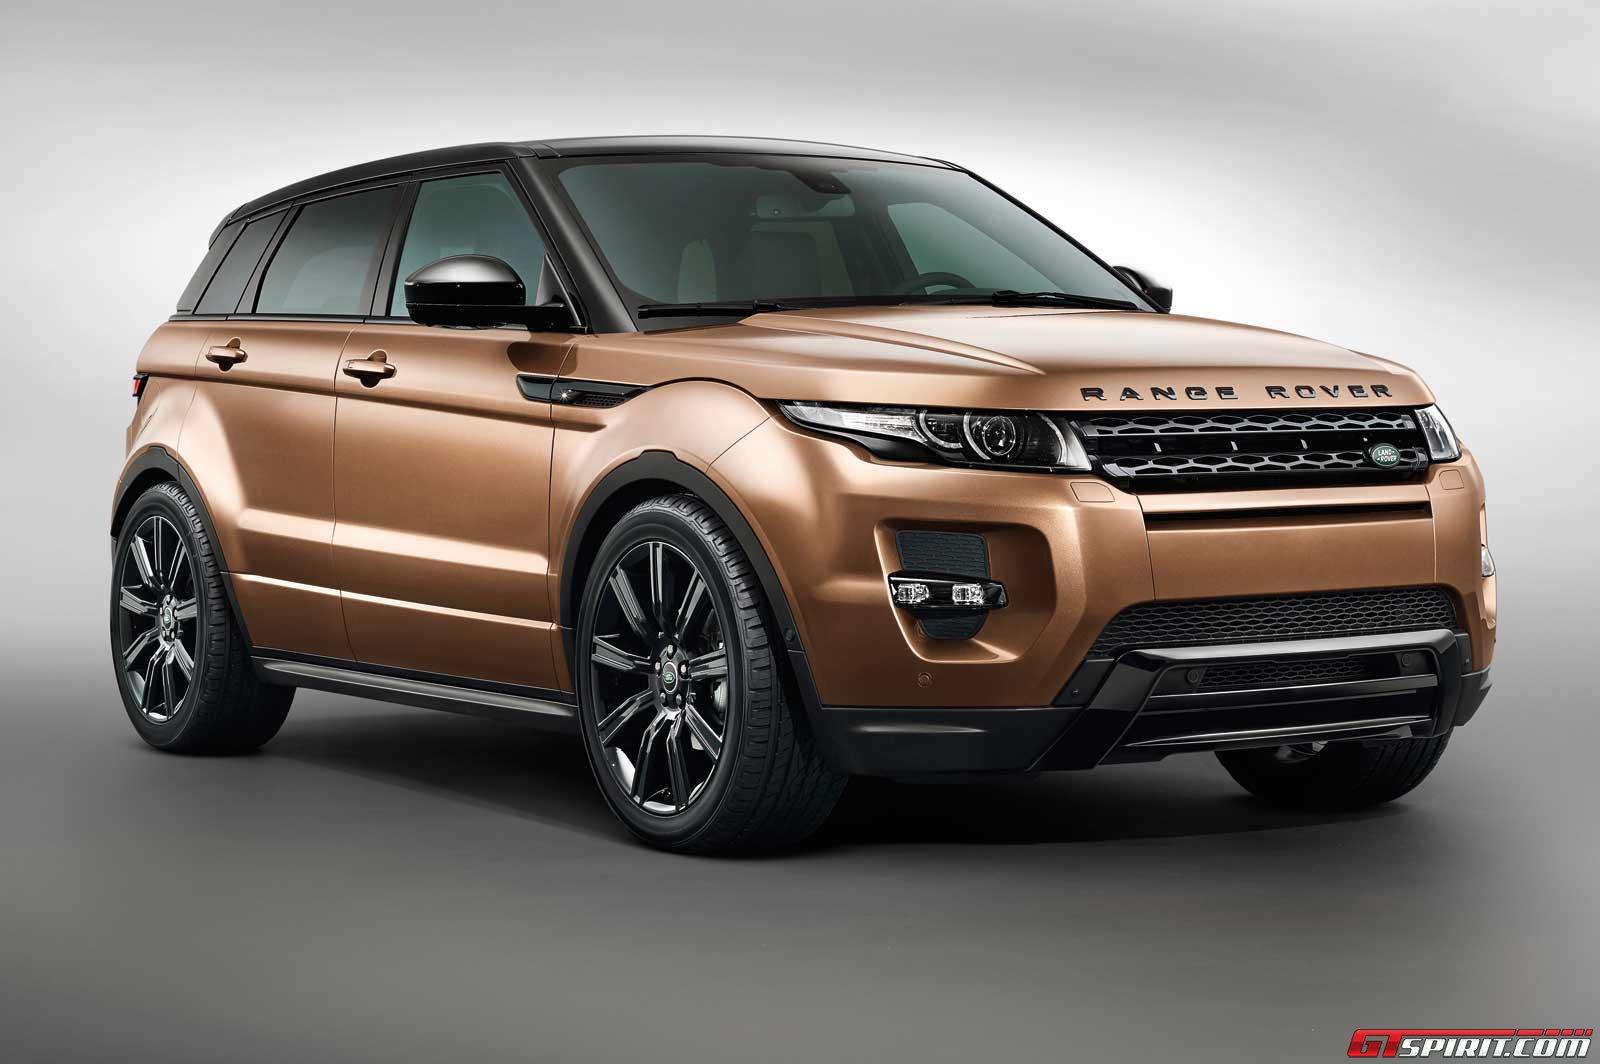 Range Rover Evoque 2014 tiết lộ hình ảnh